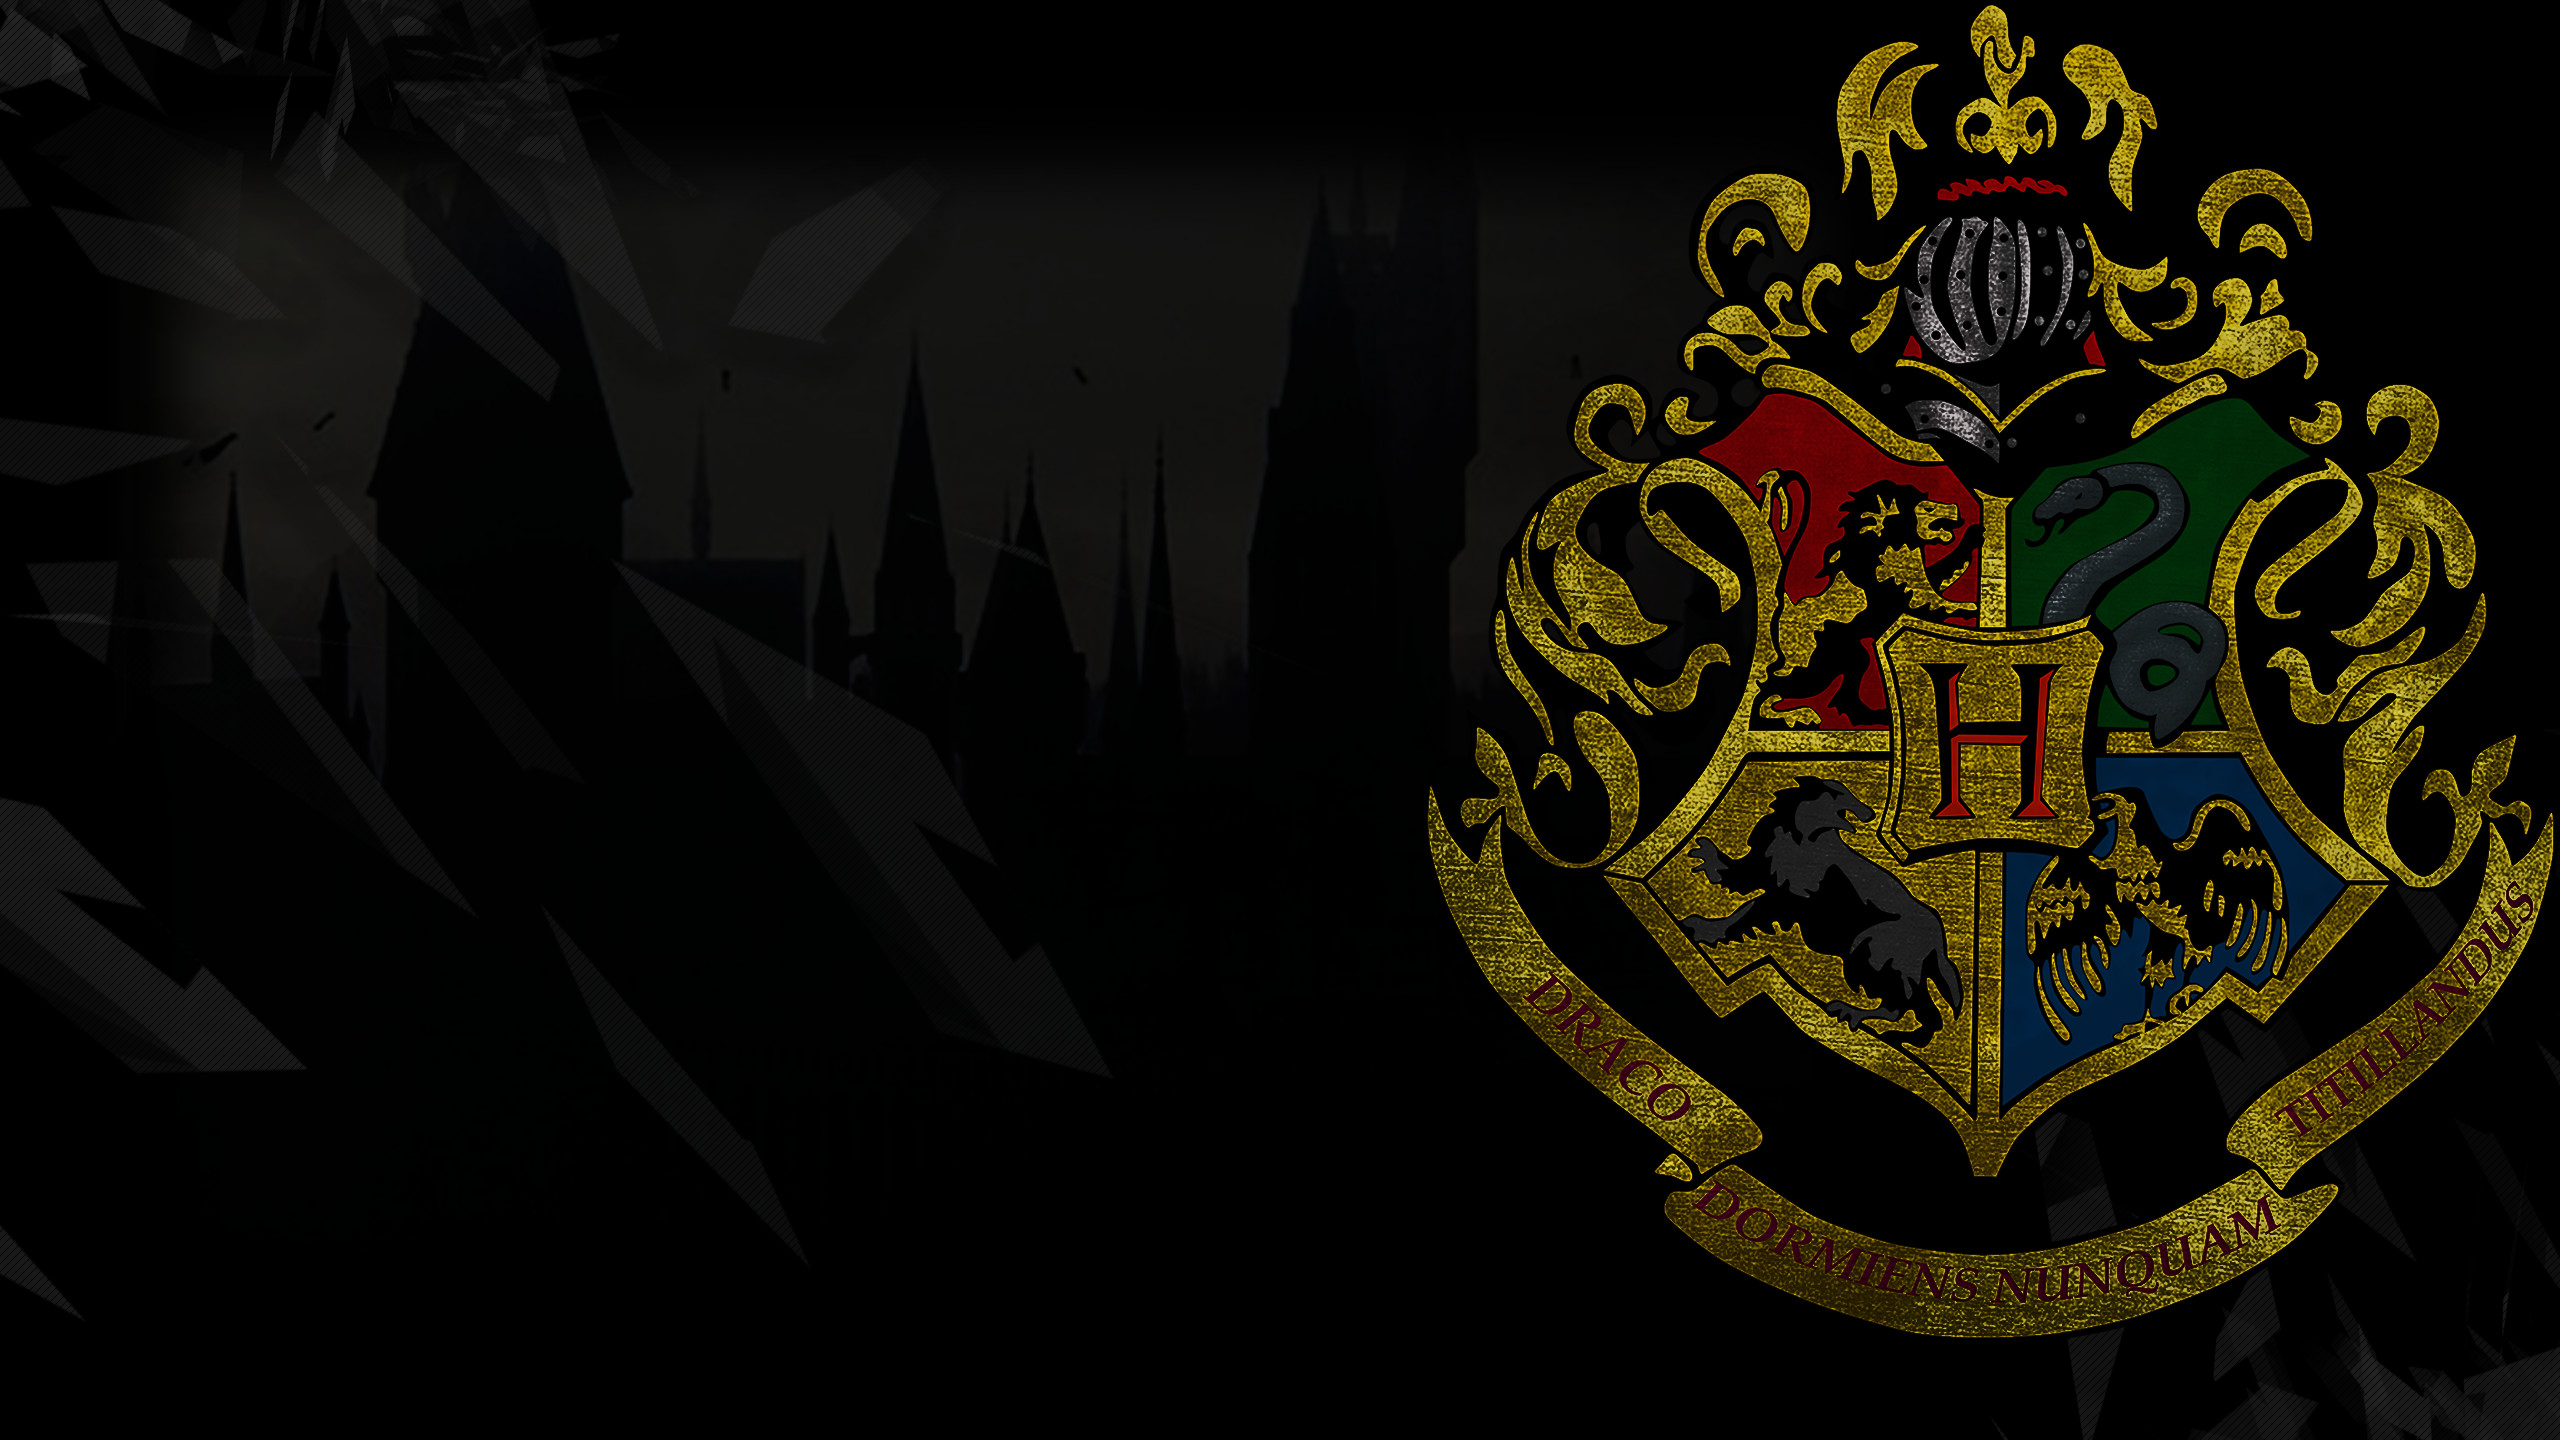 Beautiful Wallpaper Mac Harry Potter - 736848-dobby-wallpaper-2560x1440-macbook  Best Photo Reference_164761.jpg